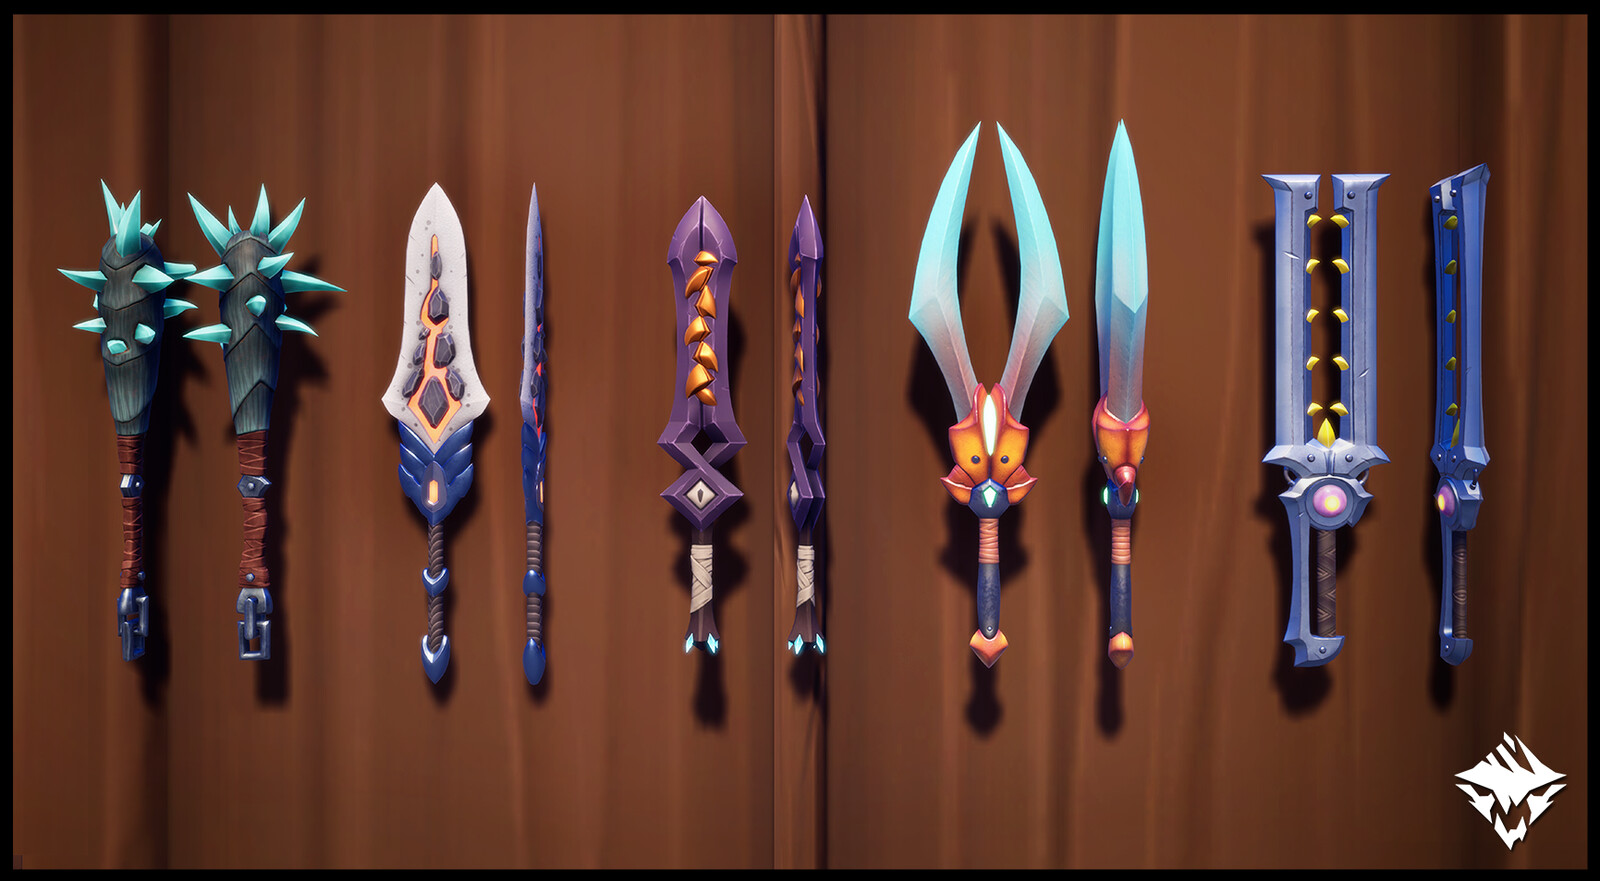 Quillshot's Tusk (Craftable), Charred Saber (Craftable), Hidden Fang (MTX), Kharabak's Spur (Craftable), Nayzaga's Razor (Craftable)